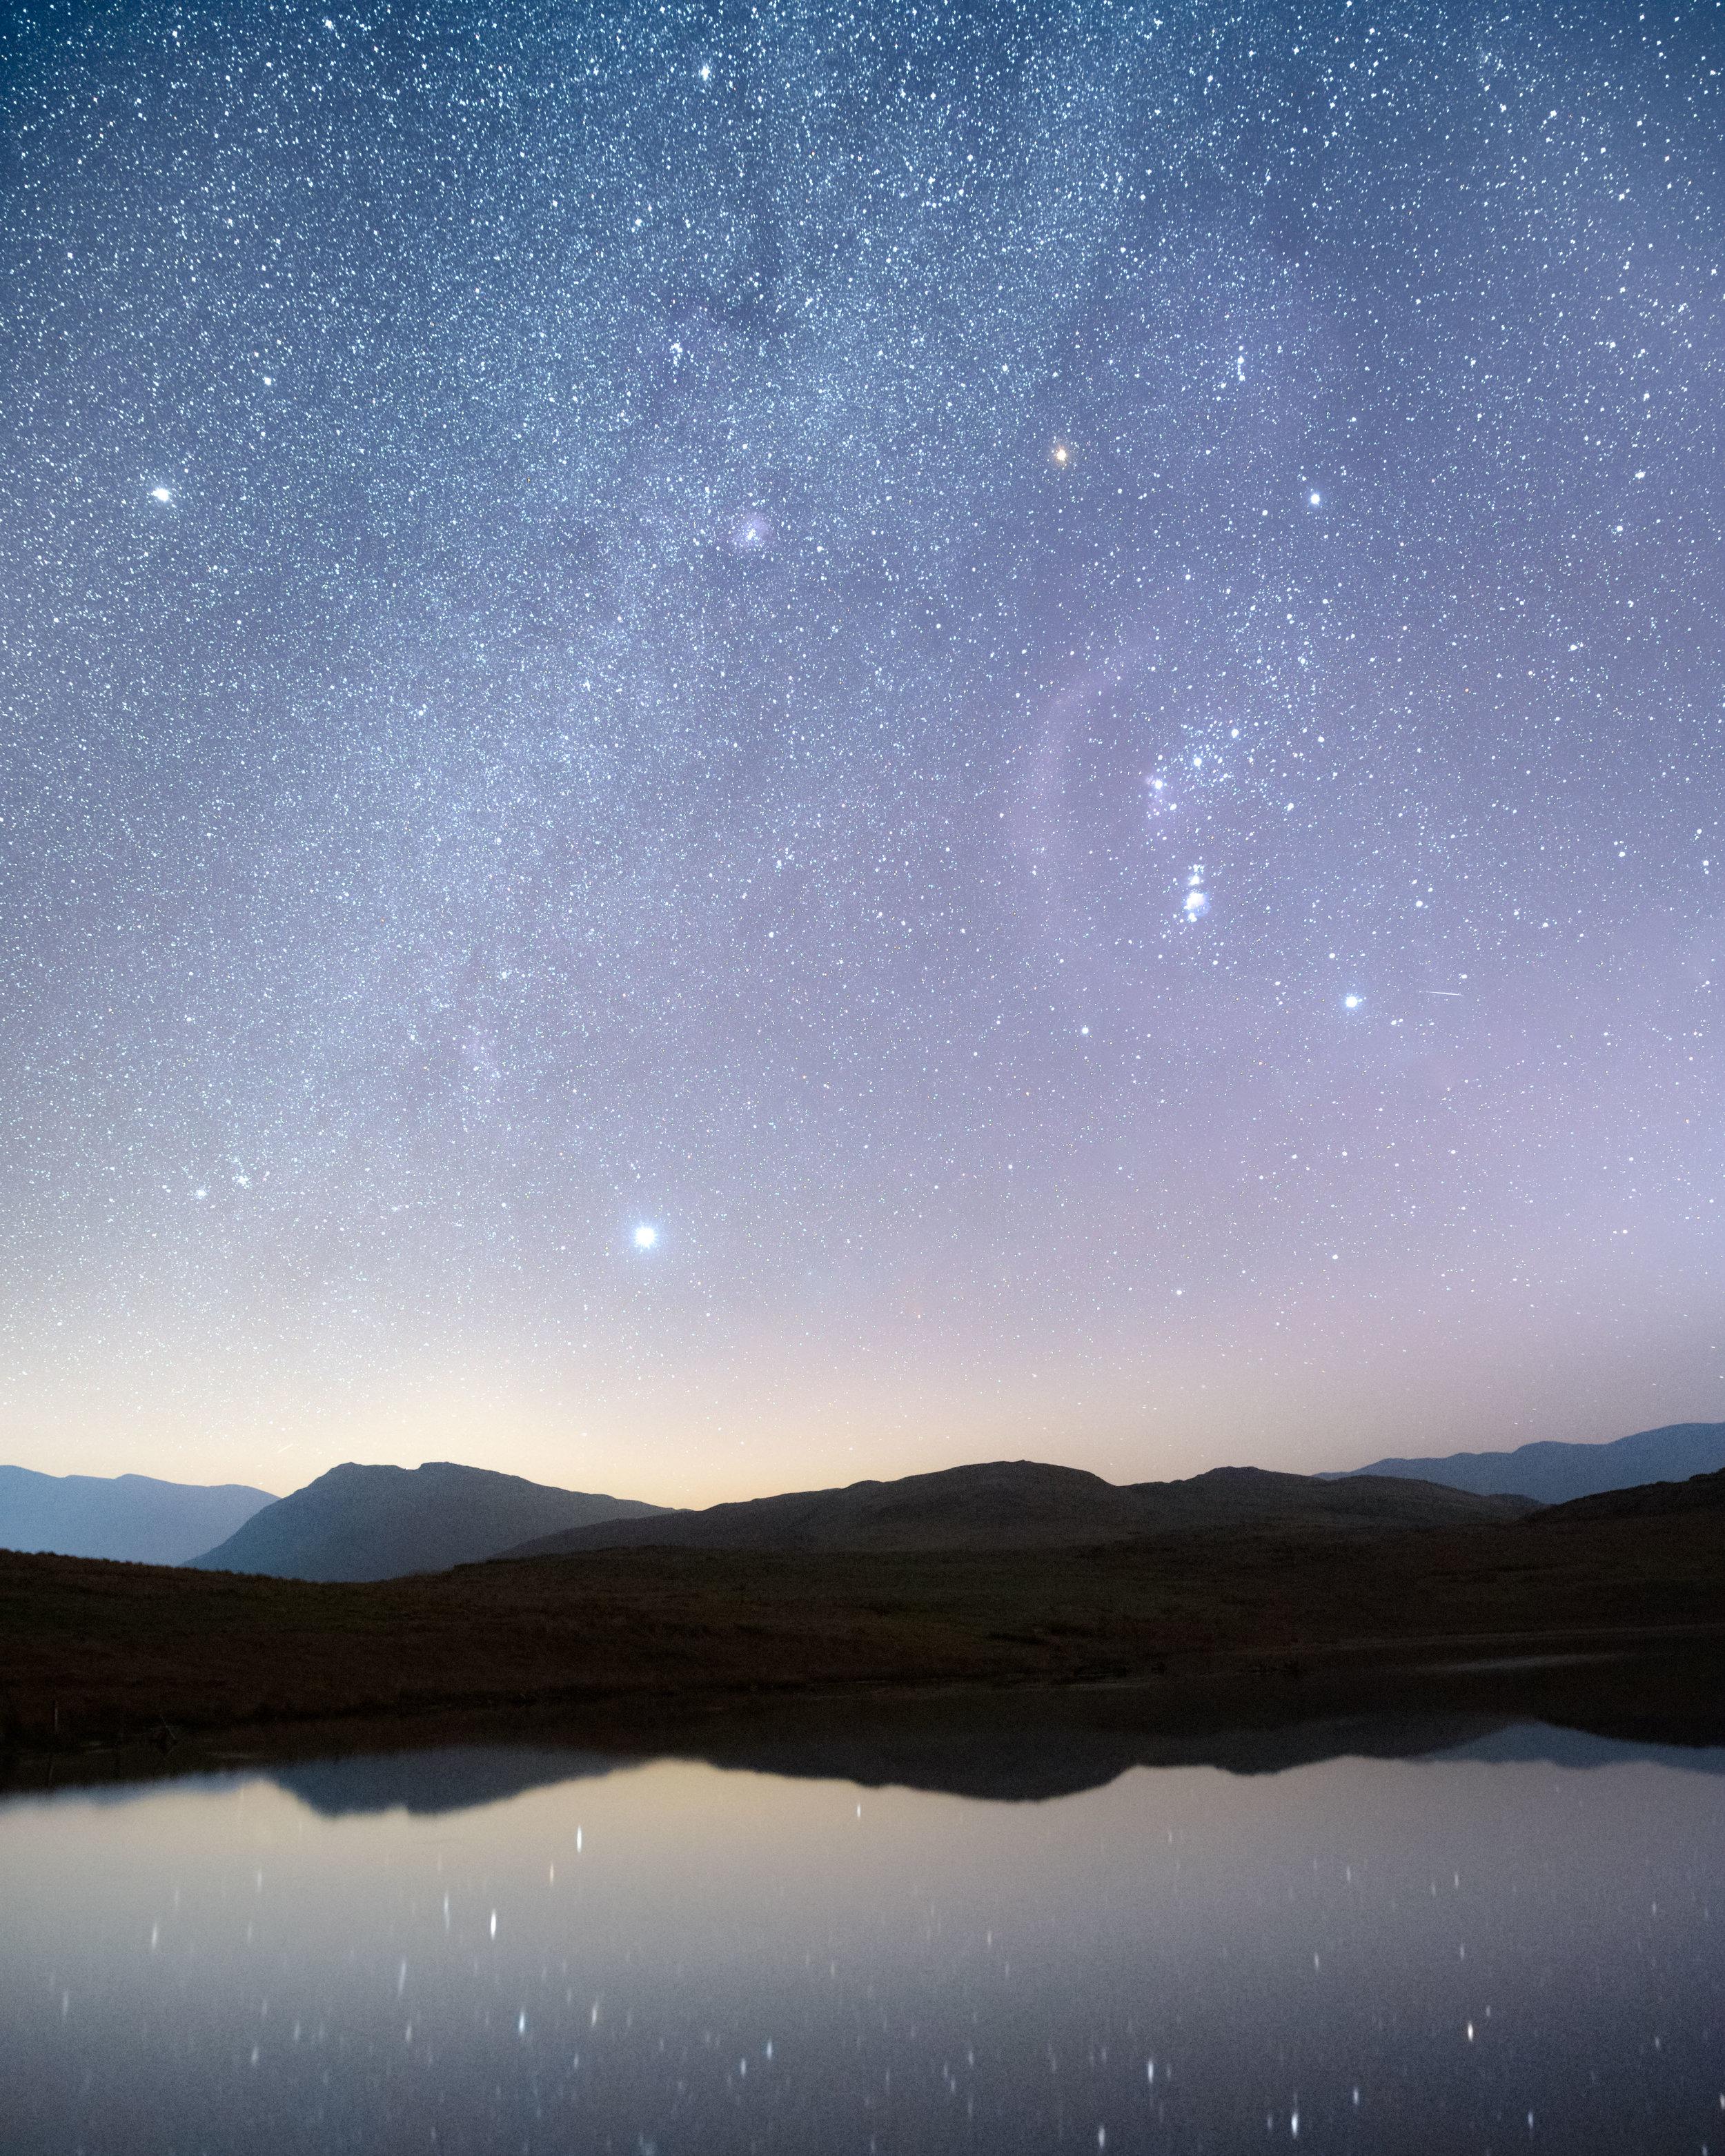 Stellar Reflections